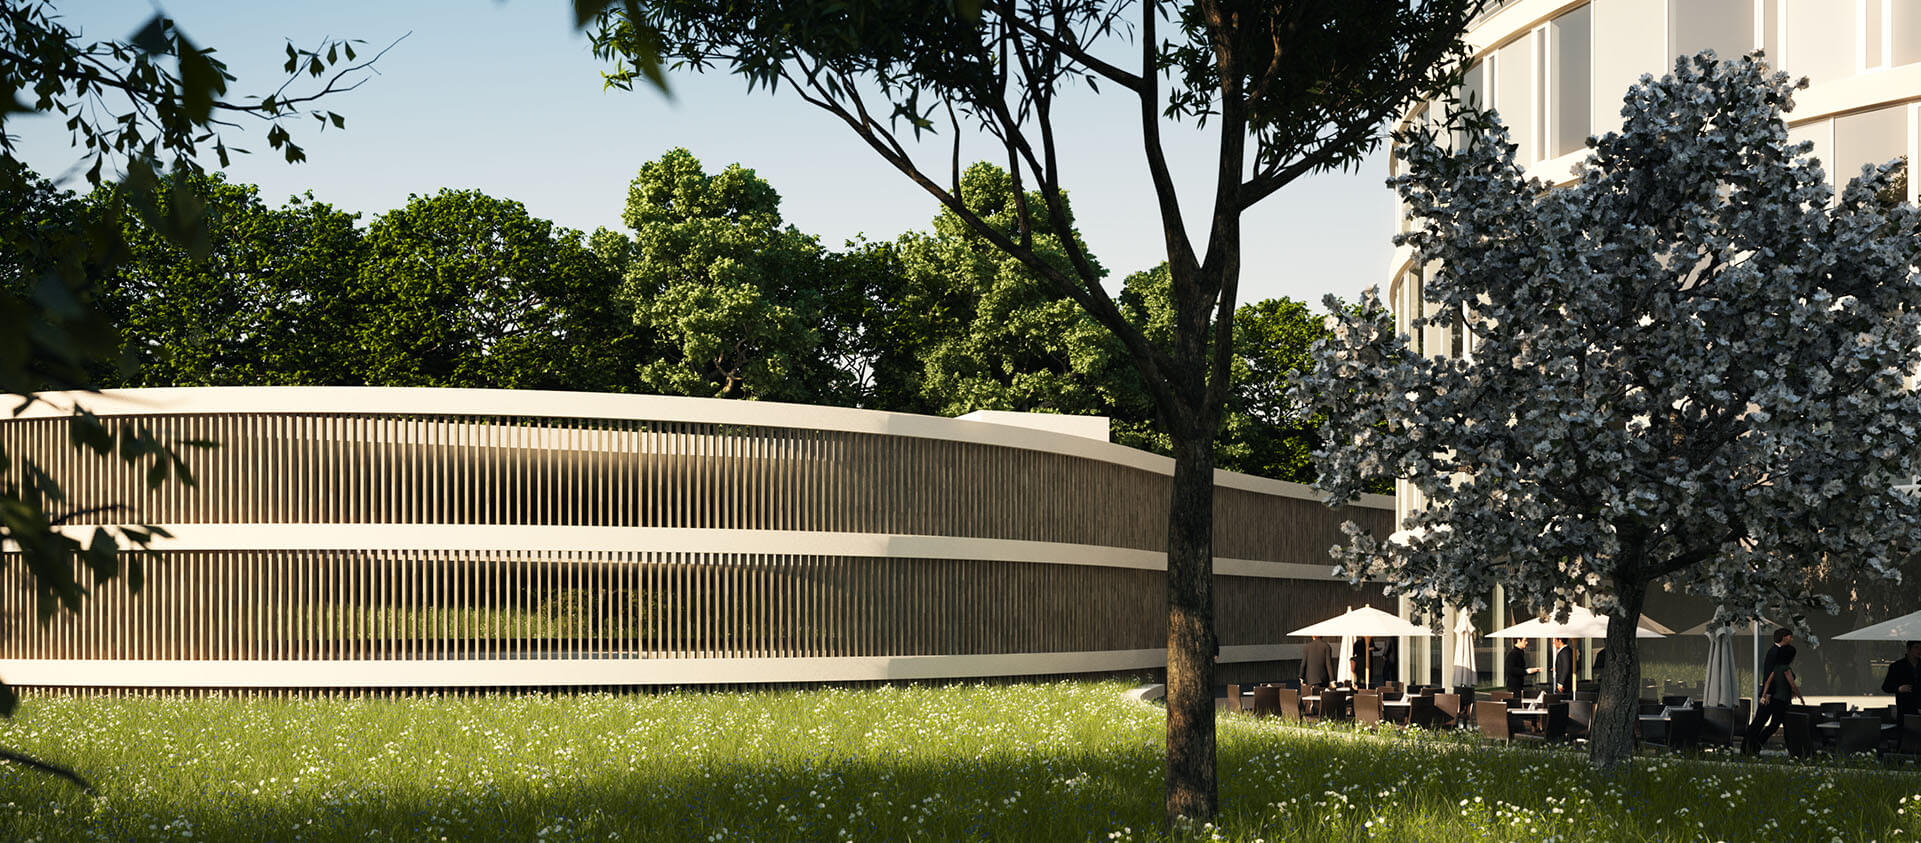 Projektentwicklung Bad Homburg Eberhard Horn Designgruppe, Blick Parkdeck Natural Balance Campus